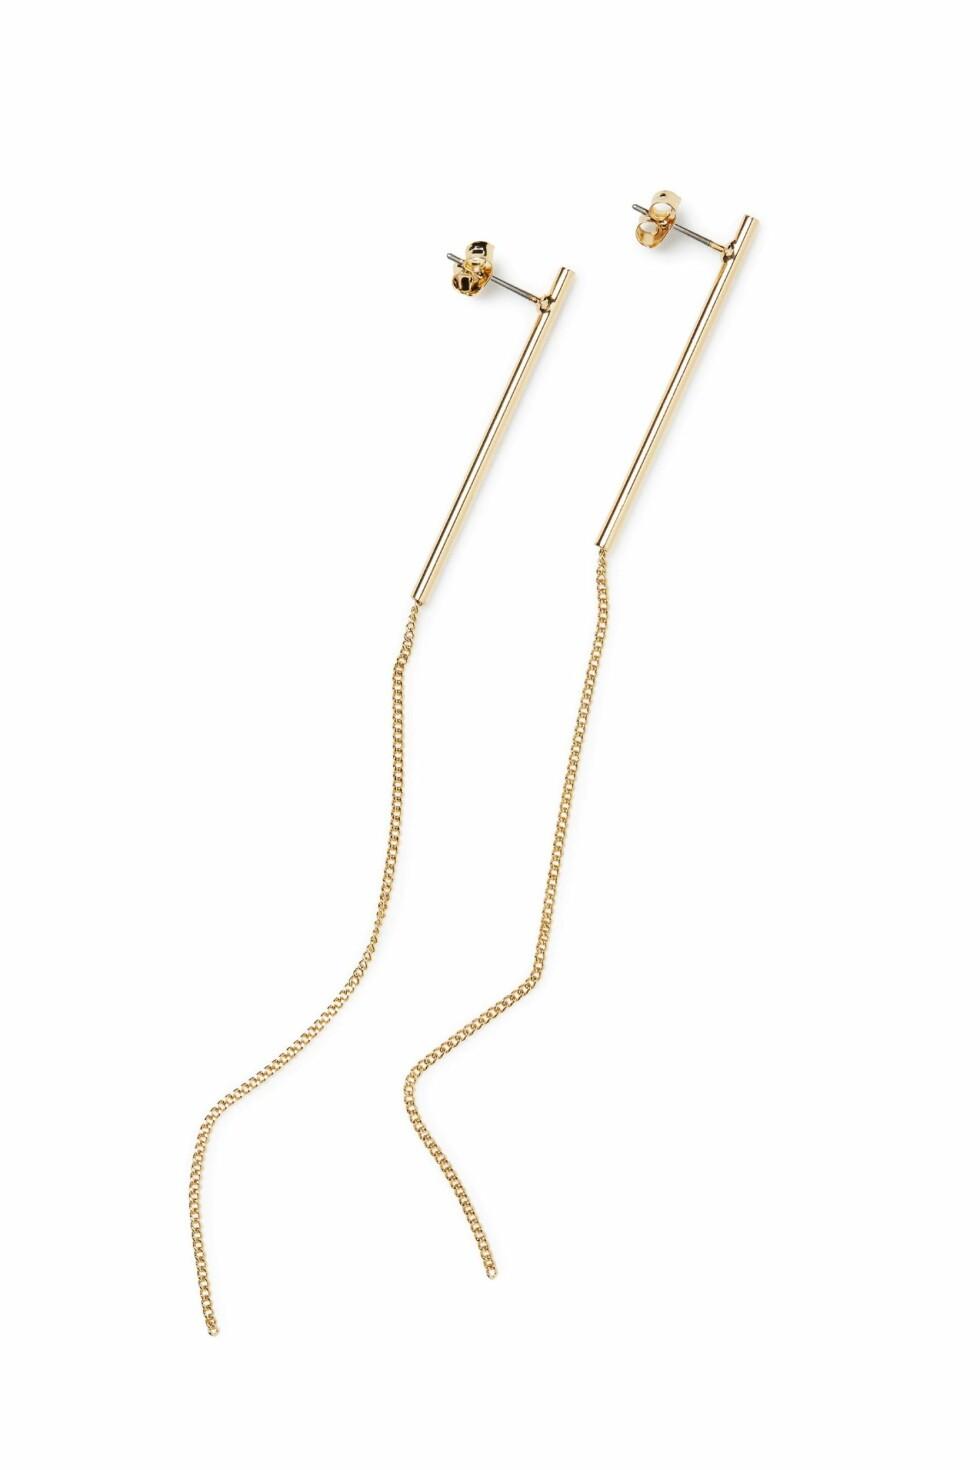 Øredobber fra Weekday   kr 80   http://shop.weekday.com/se/Womens_shop/Jewellery/Skinny_Earring/10873262-8496933.1#c-47958